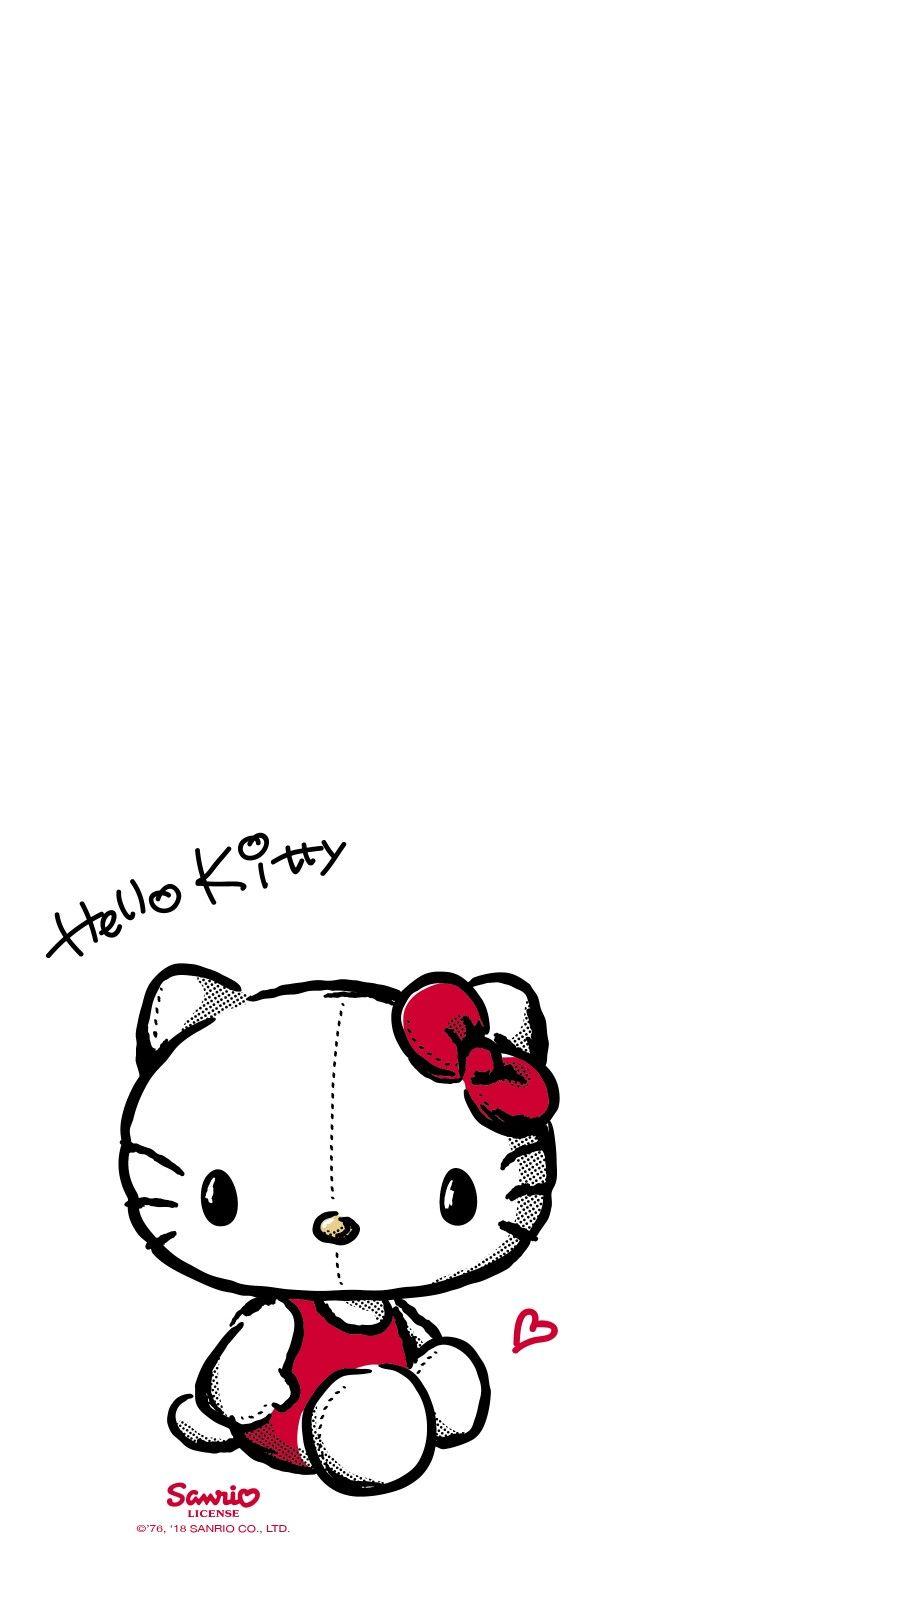 Hello Kitty Wallpaper Hello Kitty Backgrounds Hello Kitty Pictures Hello Kitty Wallpaper